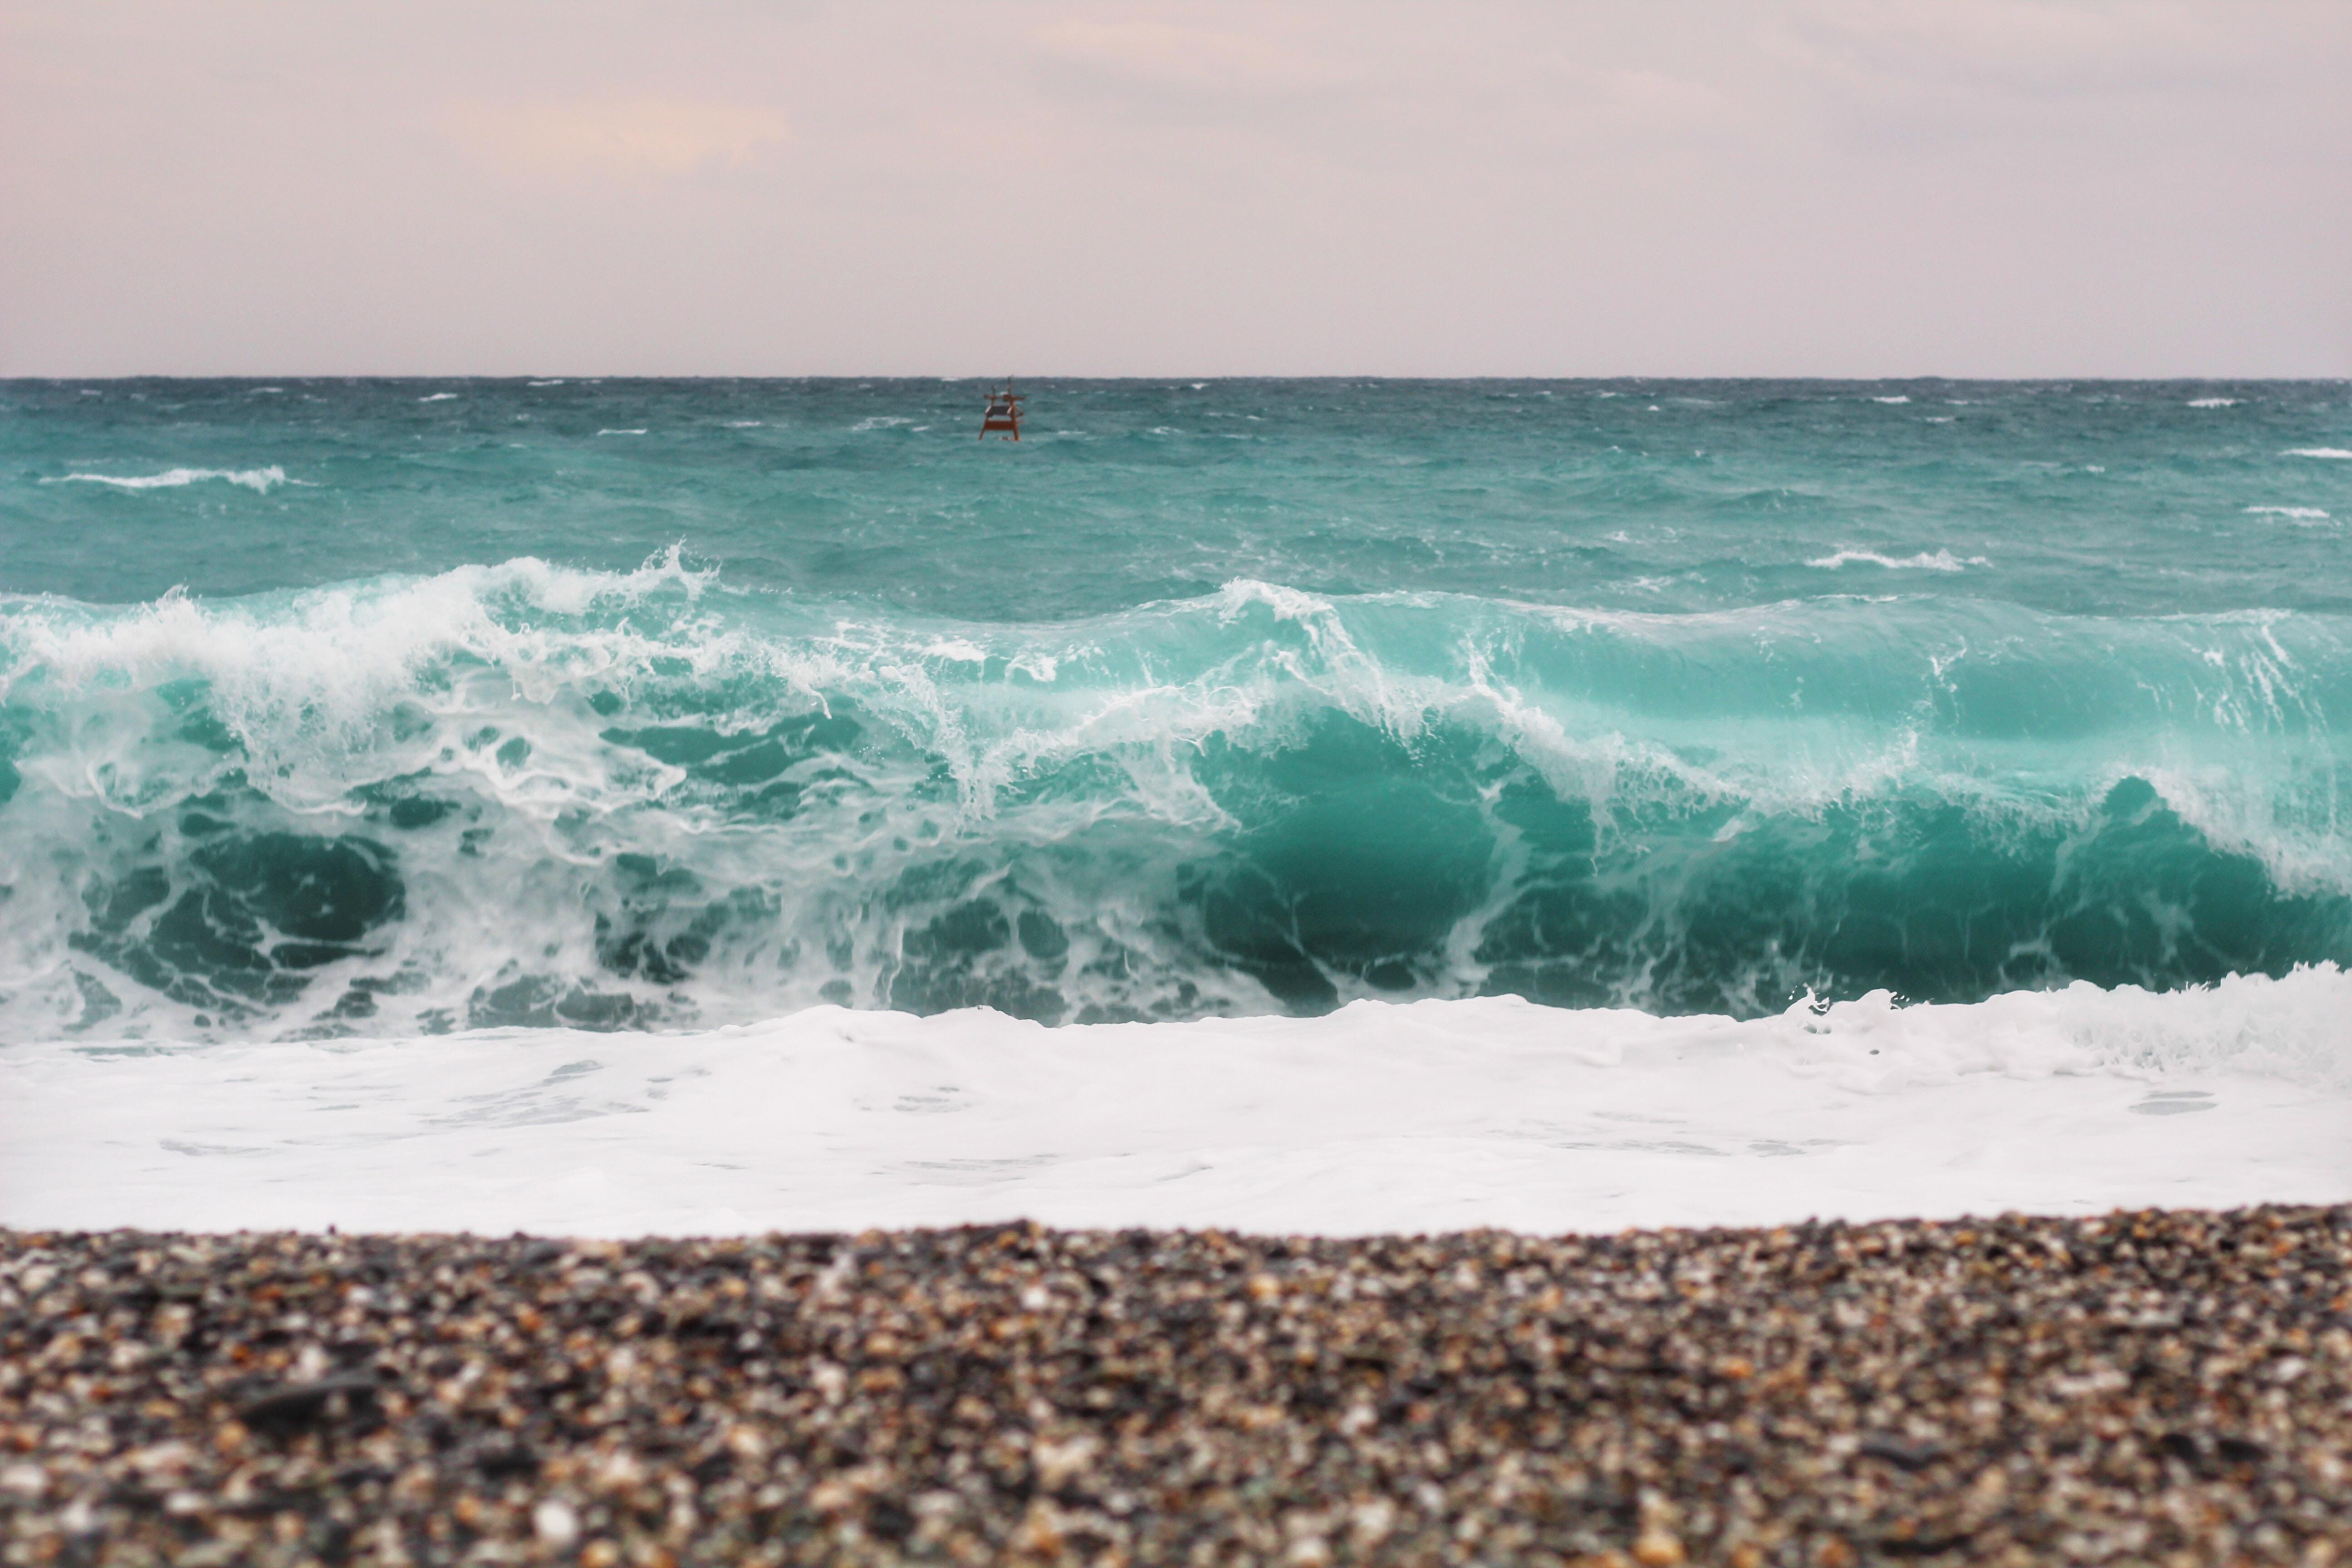 Wave crashing with foam on the pebble beach